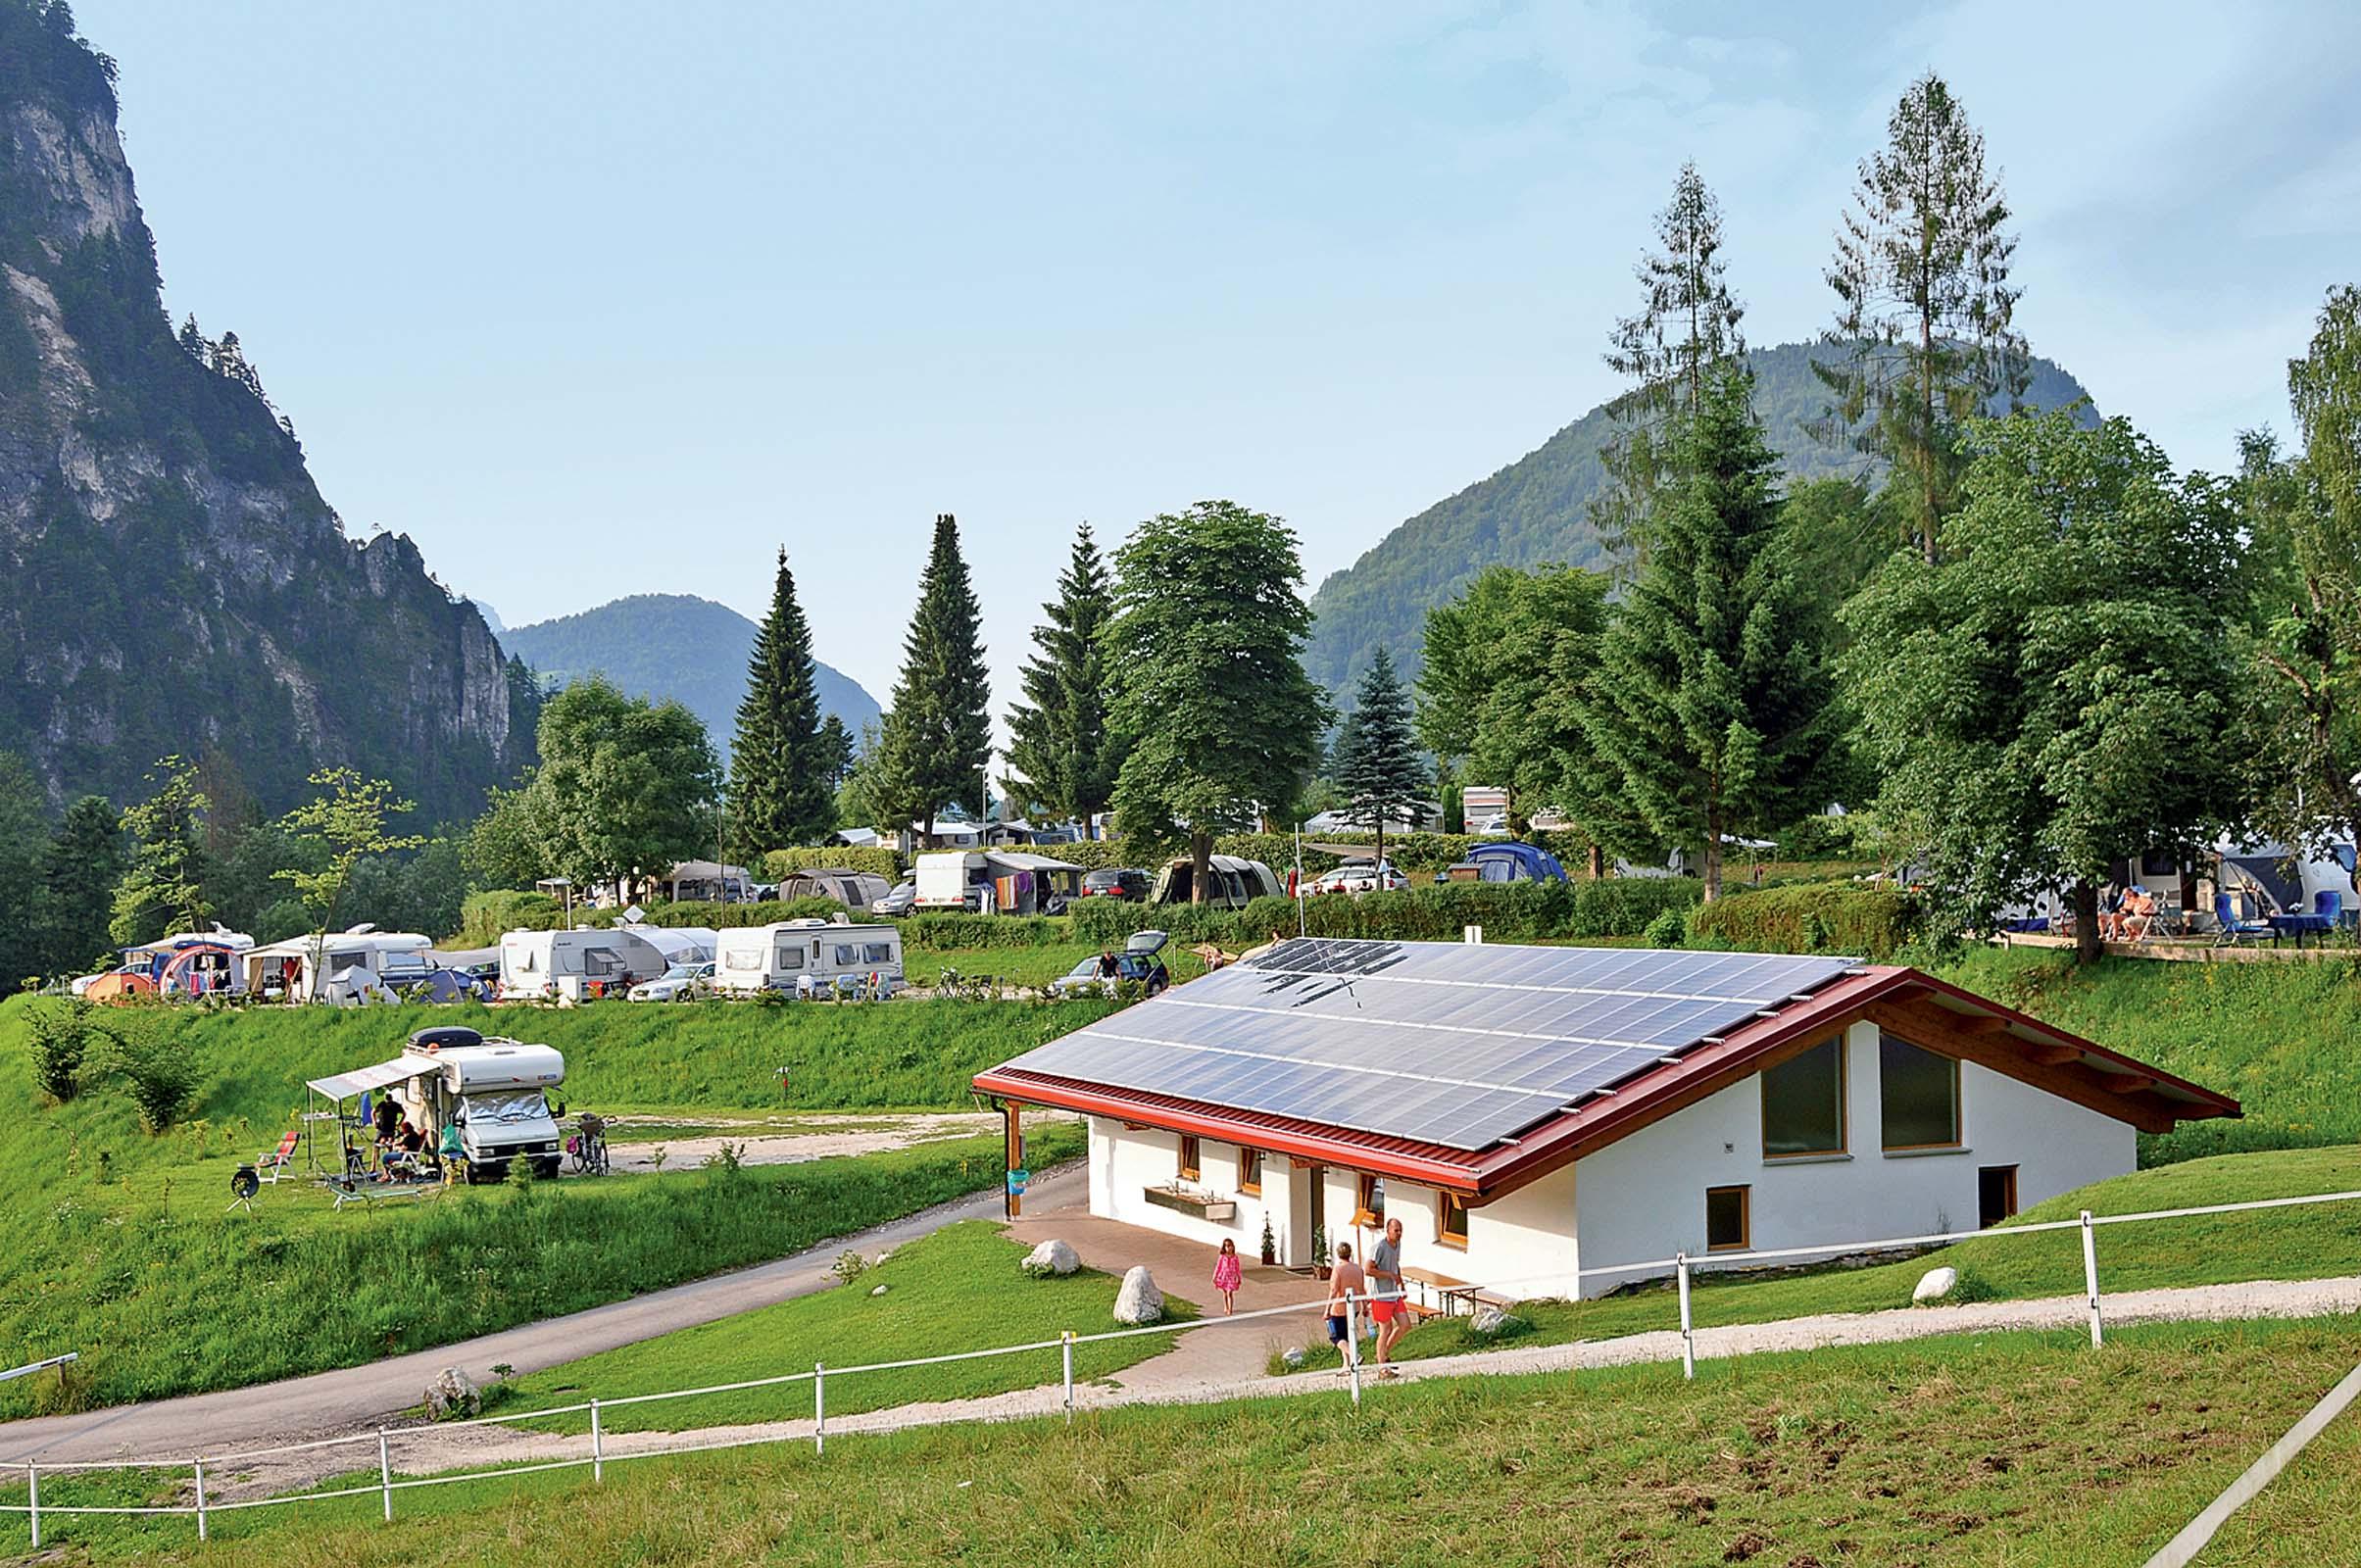 stellplatz am camping resort allweglehen berchtesgaden. Black Bedroom Furniture Sets. Home Design Ideas